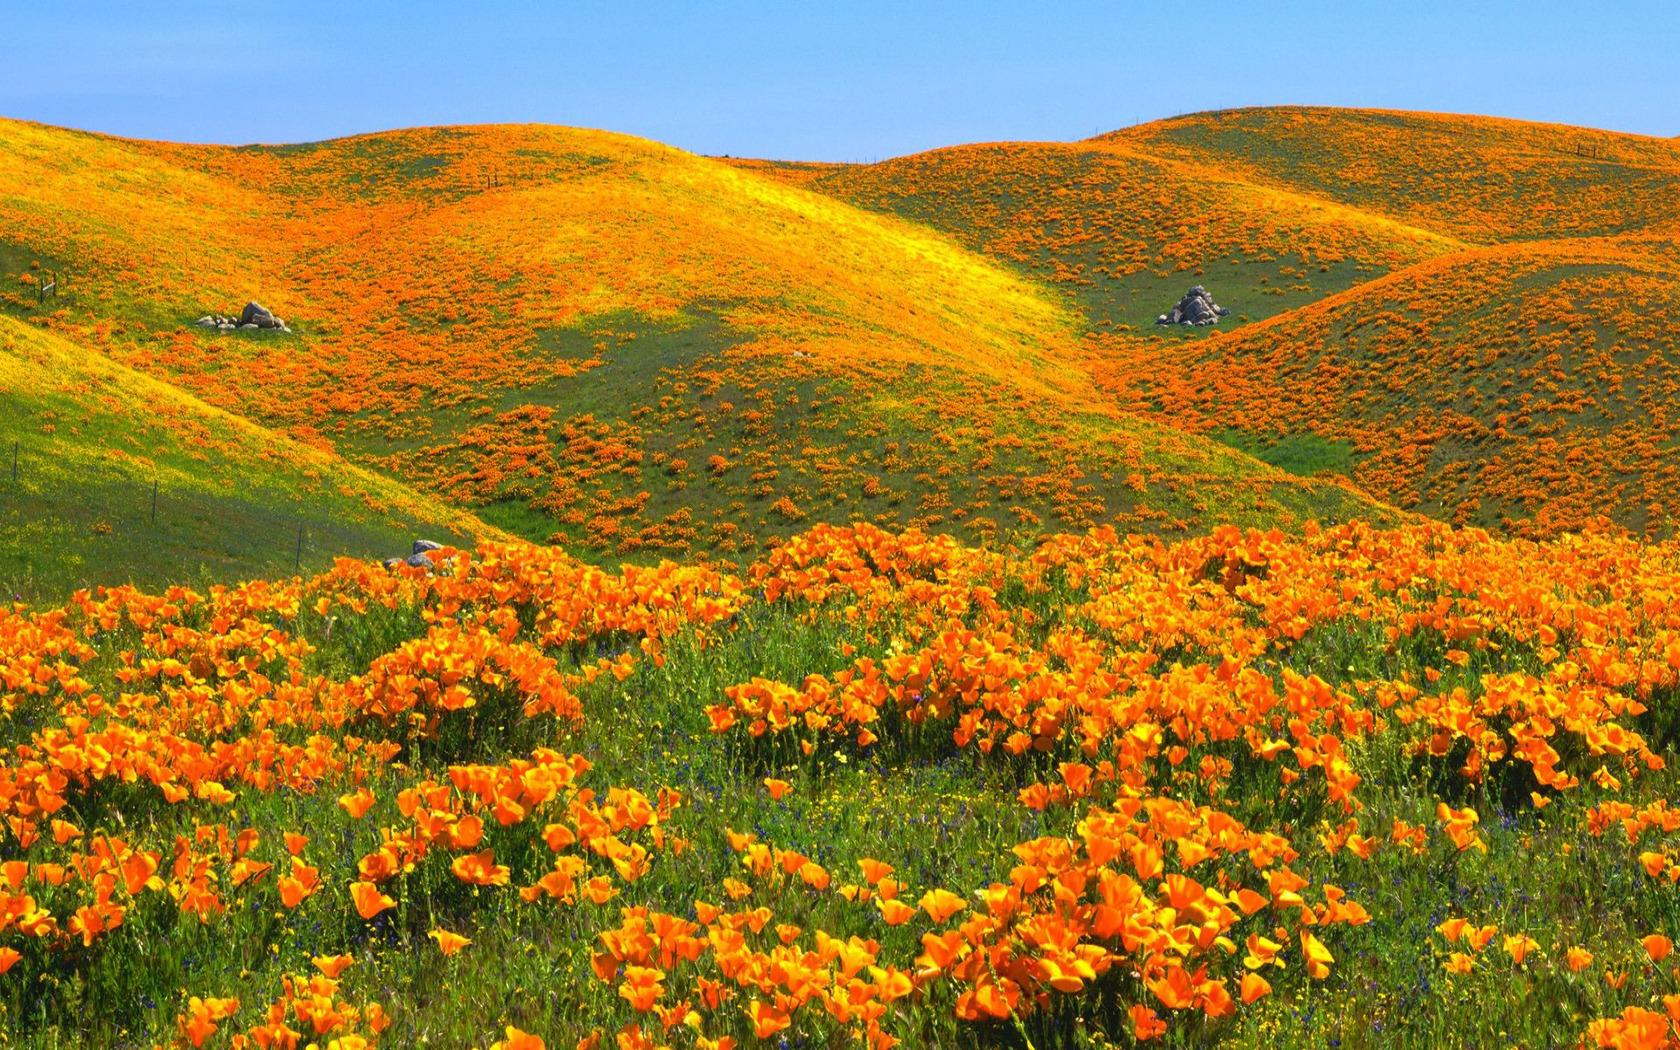 Download California poppy field wallpaper 1680x1050